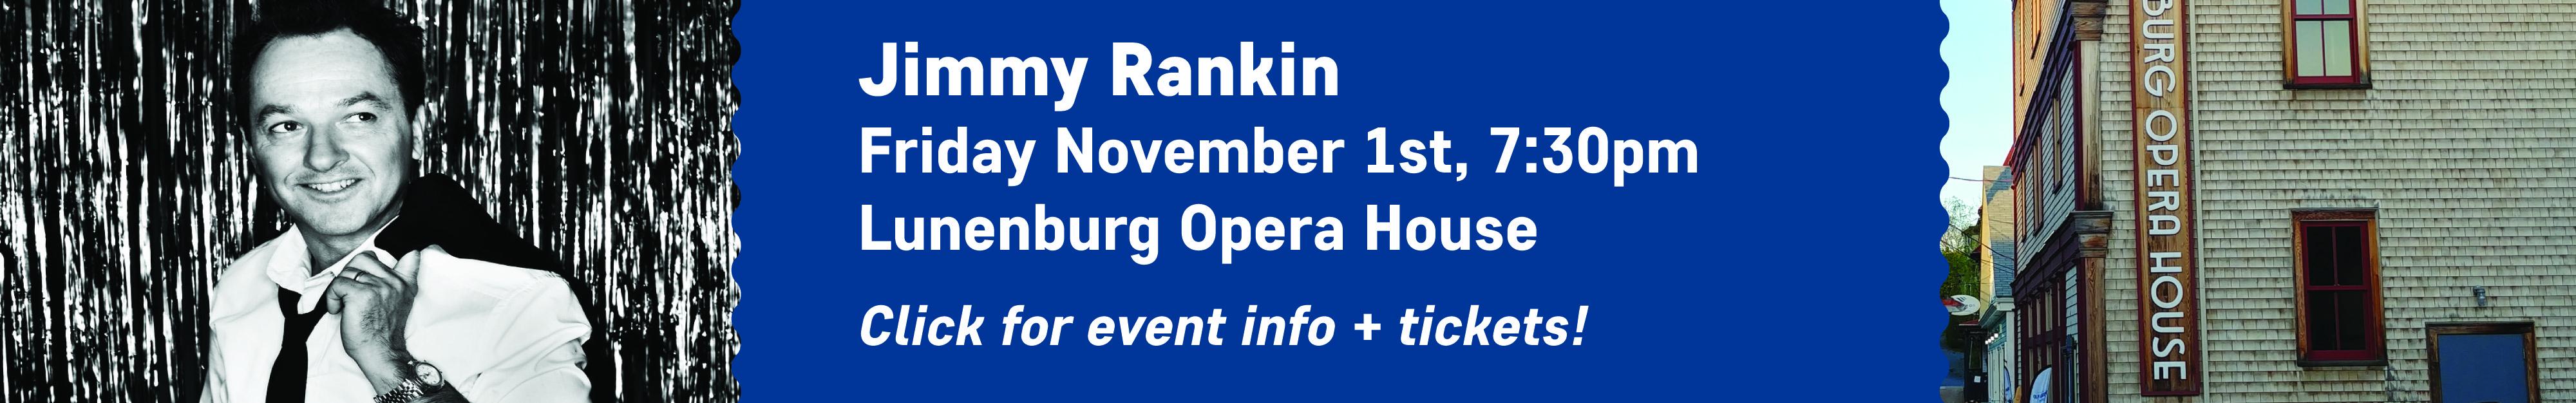 Jimmy Rankin - Lunenburg Opera House